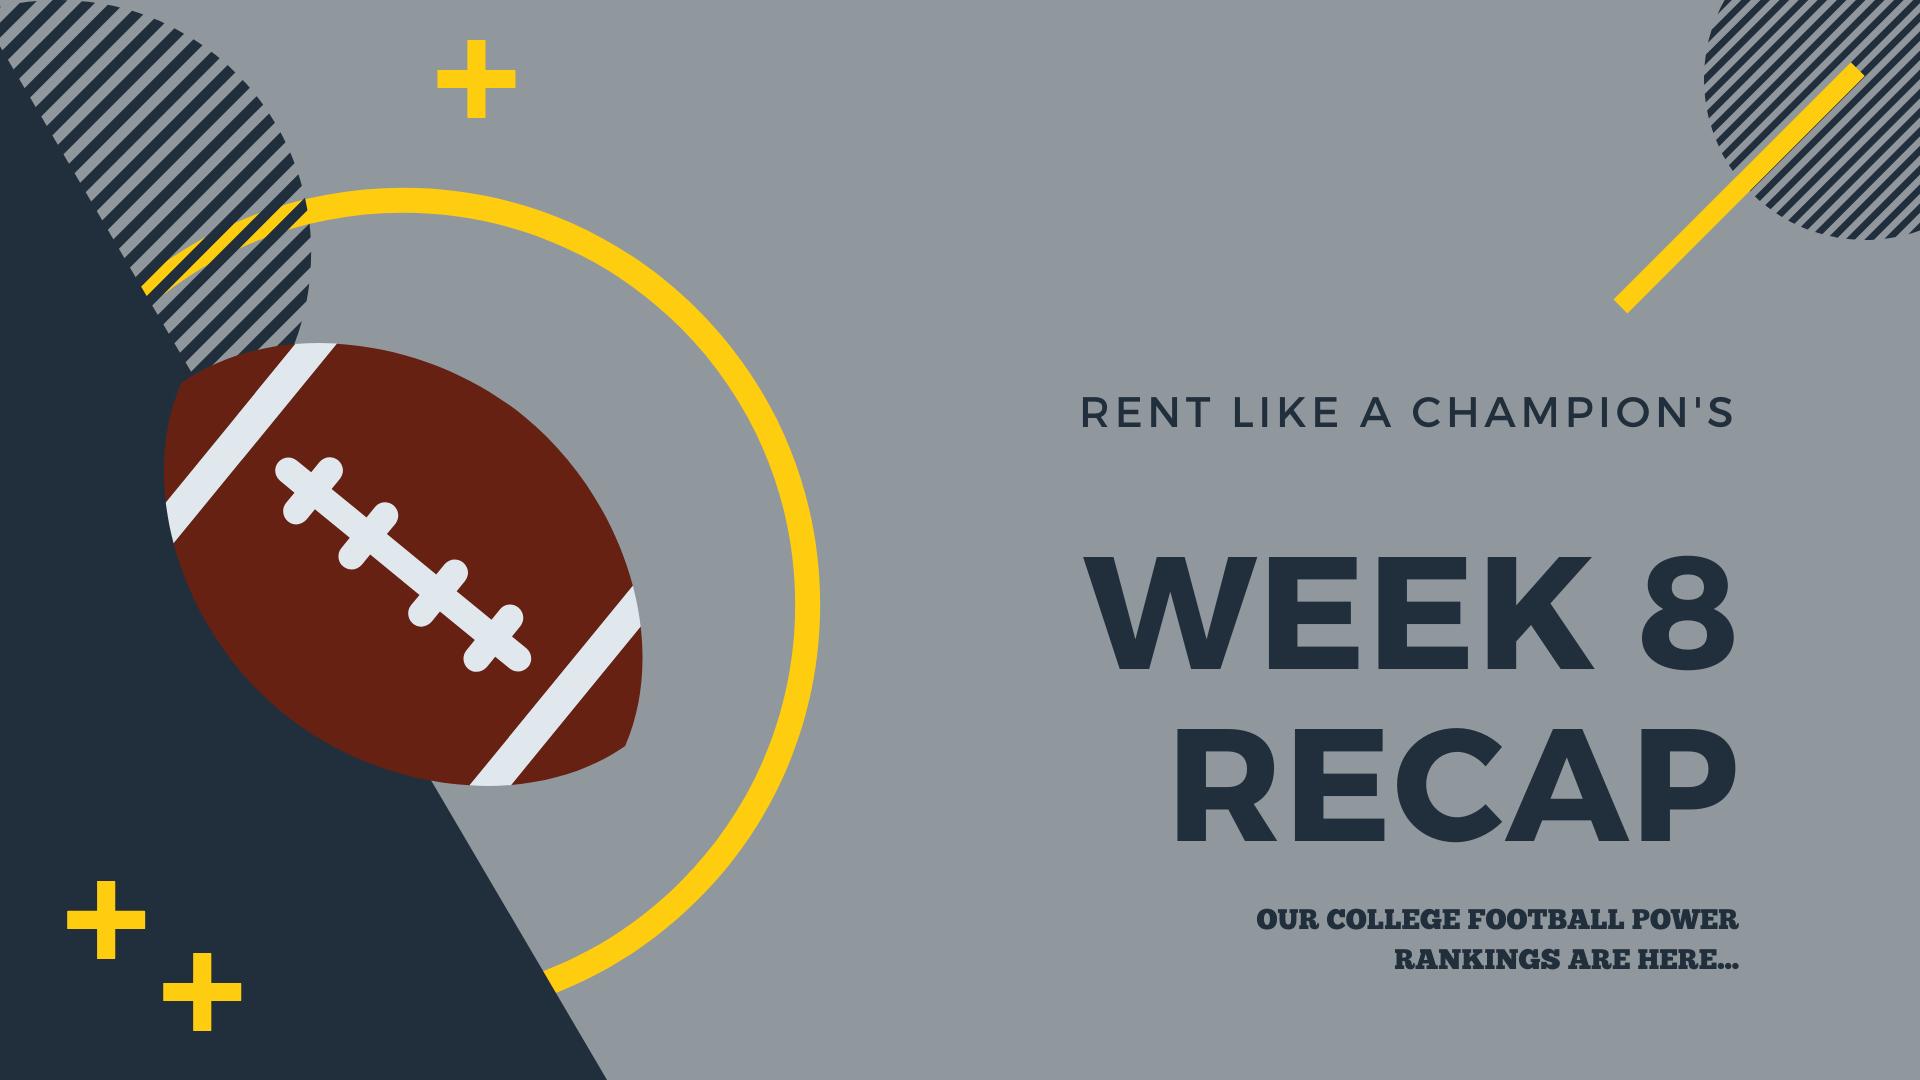 Week Recap Template (4)